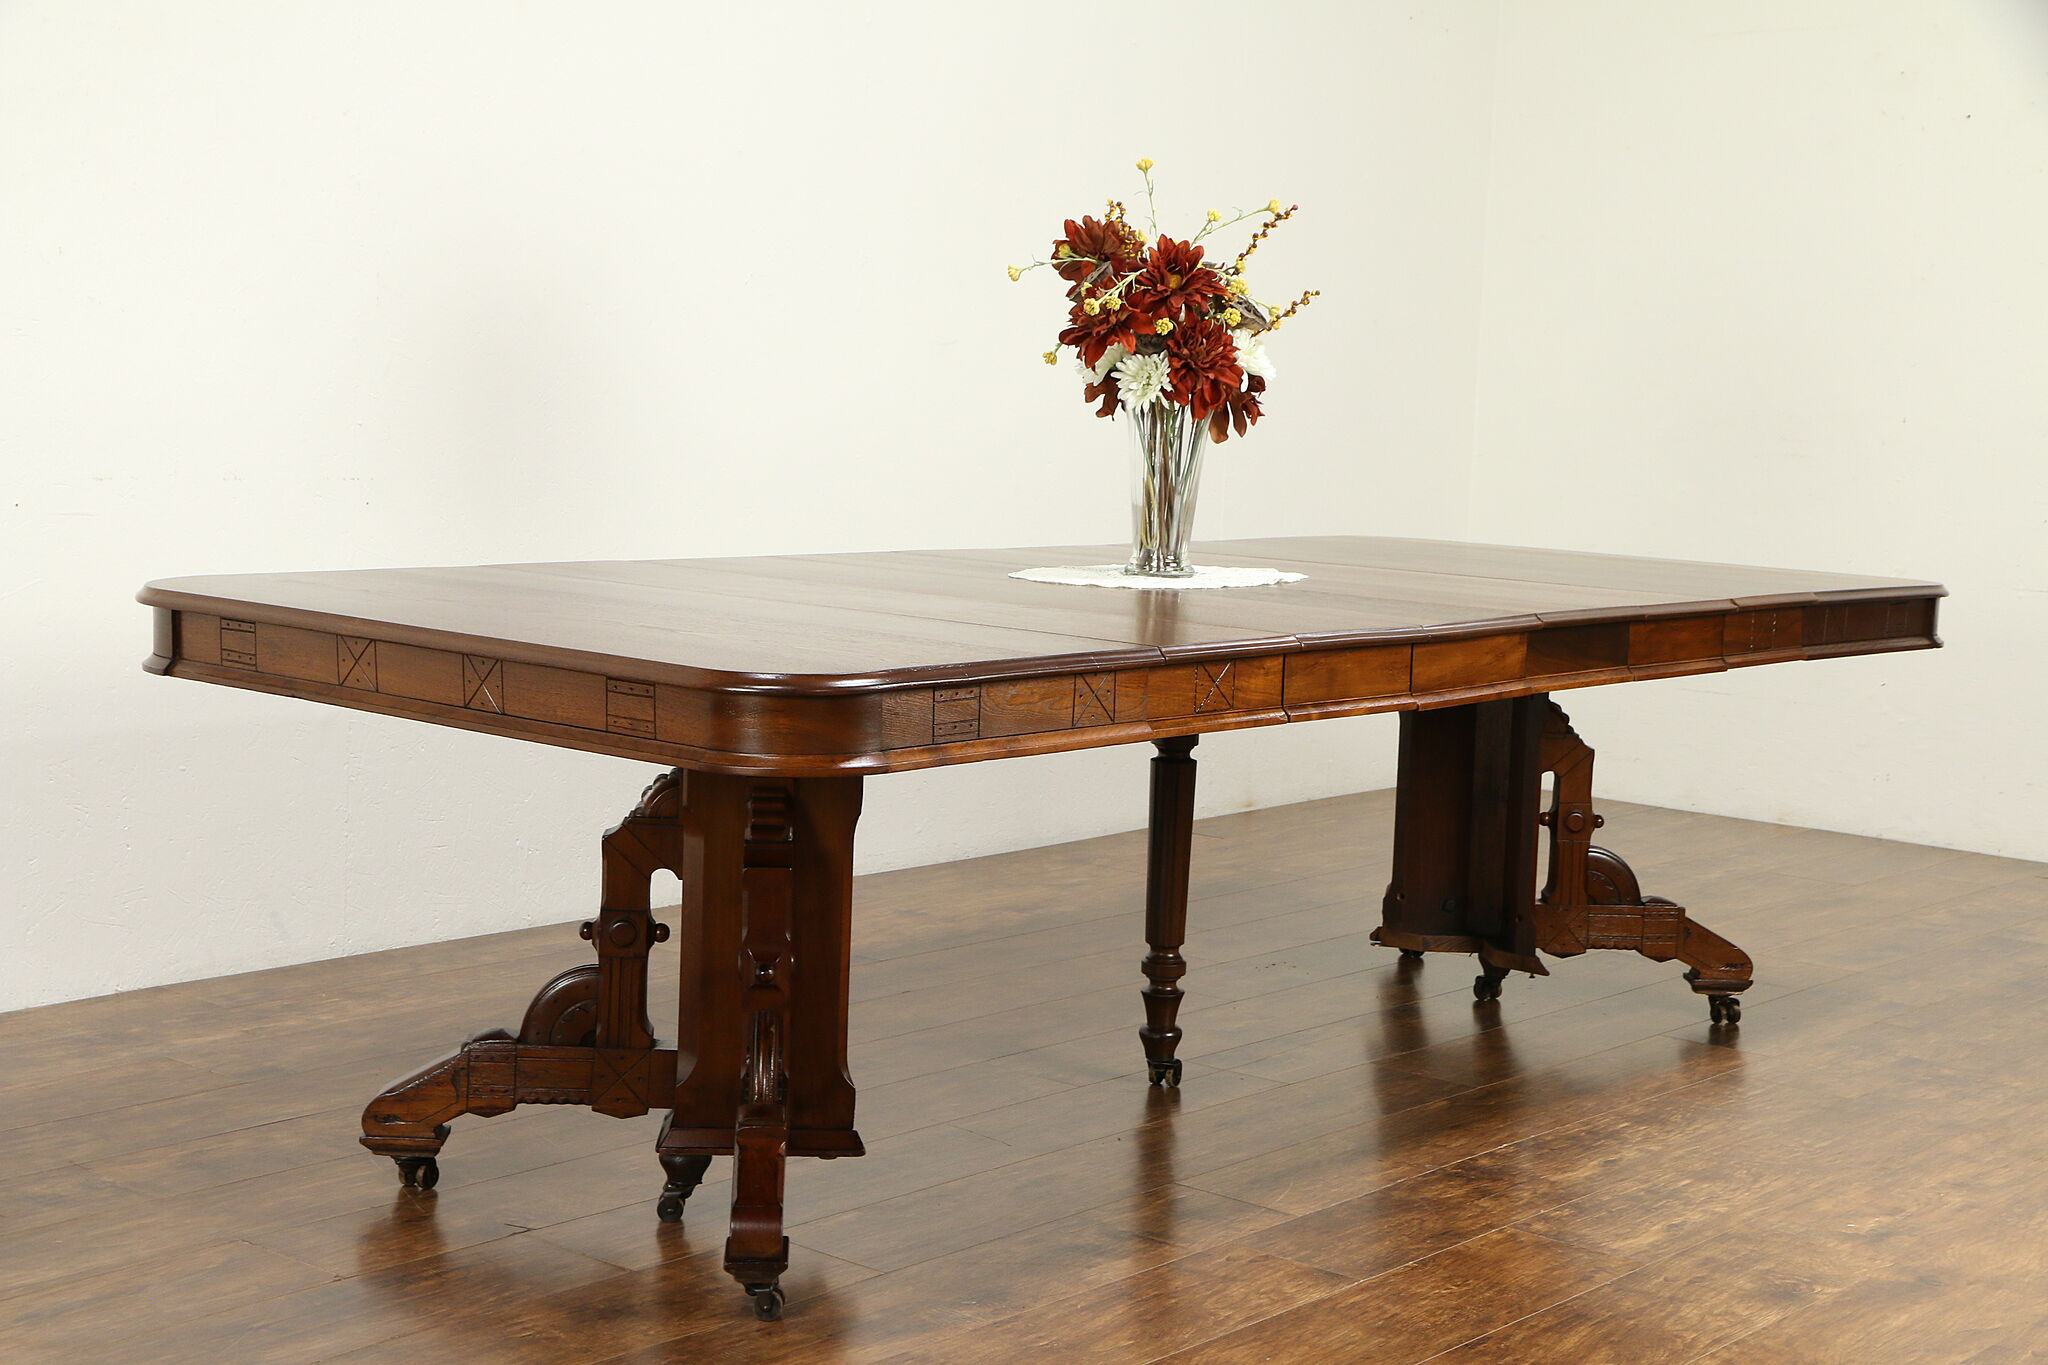 Victorian Eastlake Antique Walnut Dining Table, 6 Leaves, 110\